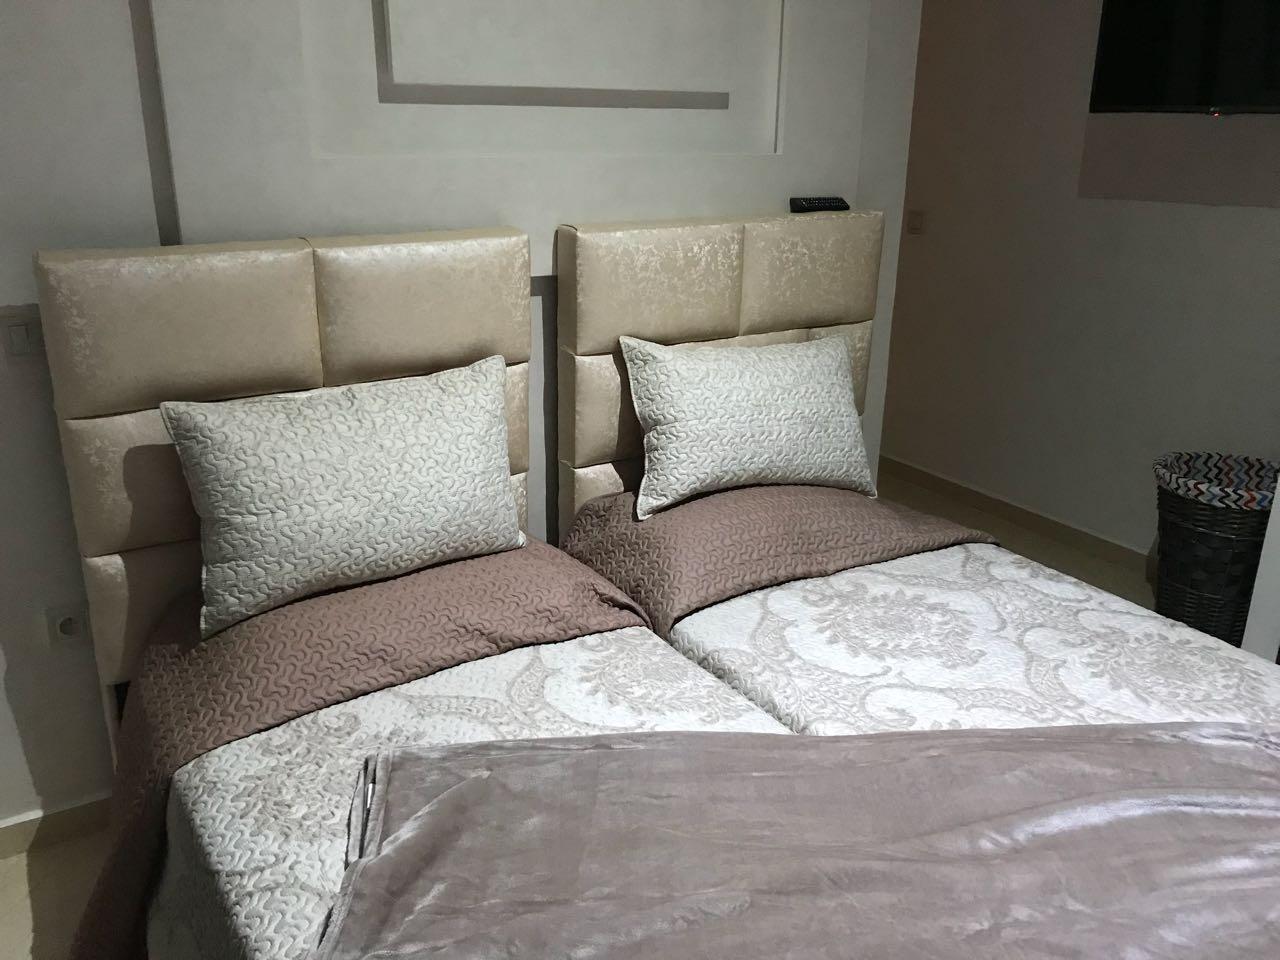 Image belle studio meublé wifi ascenseur parking ain sebaa casablanca maroc 4